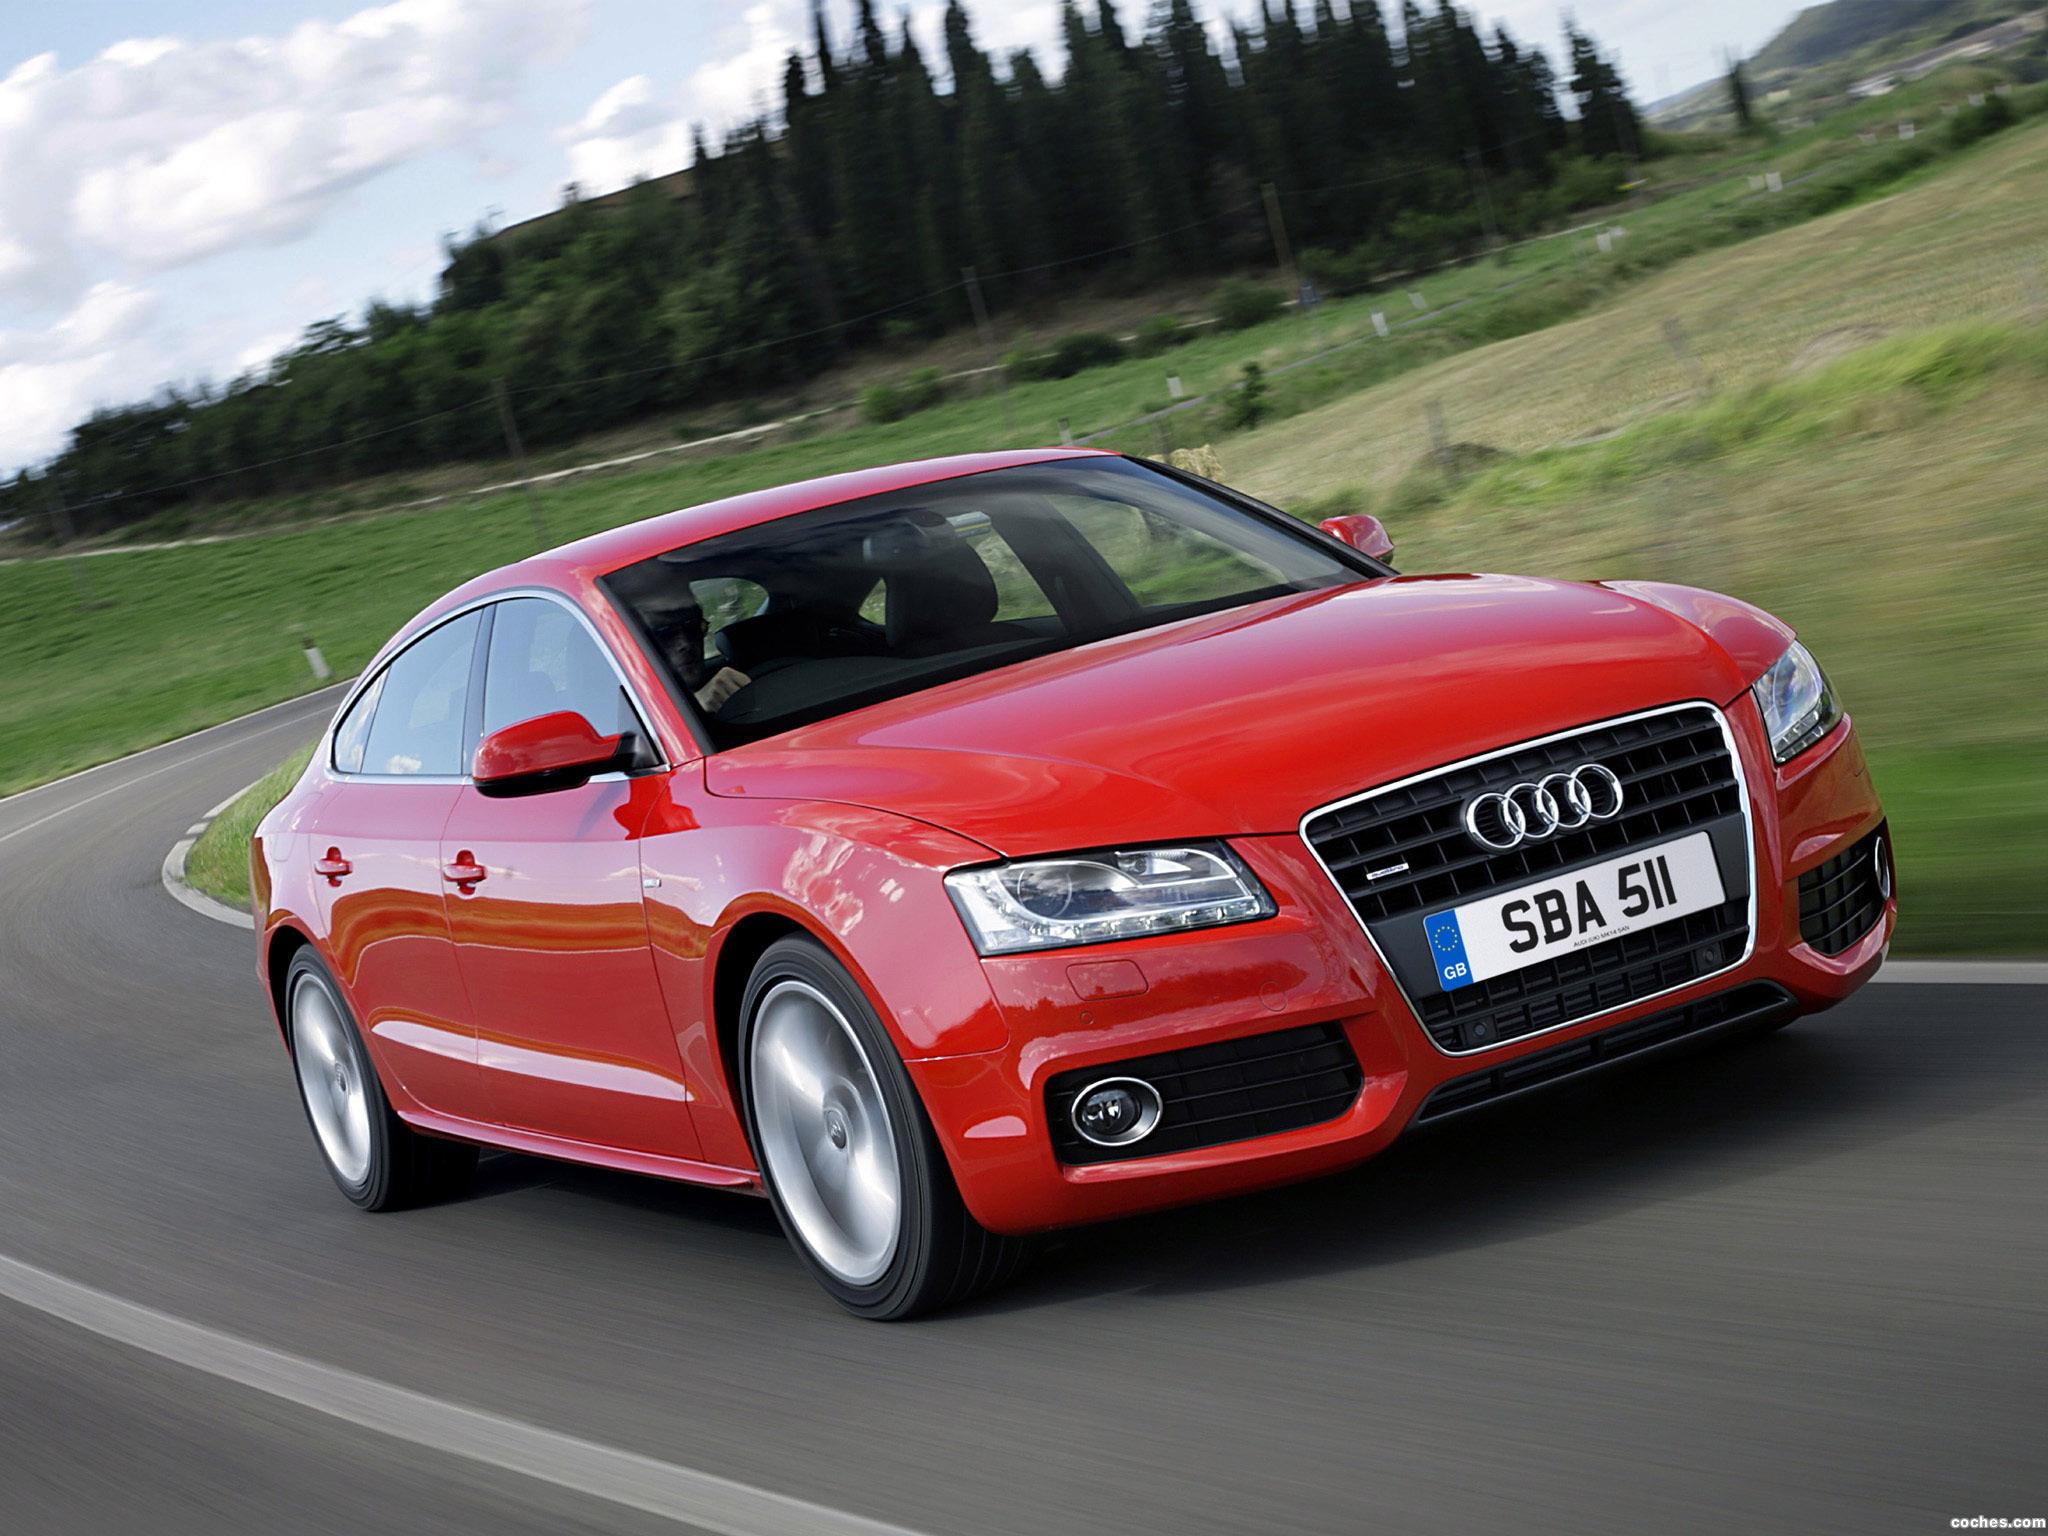 Foto 0 de Audi A5 Sportback 2.0T S-Line UK 2009